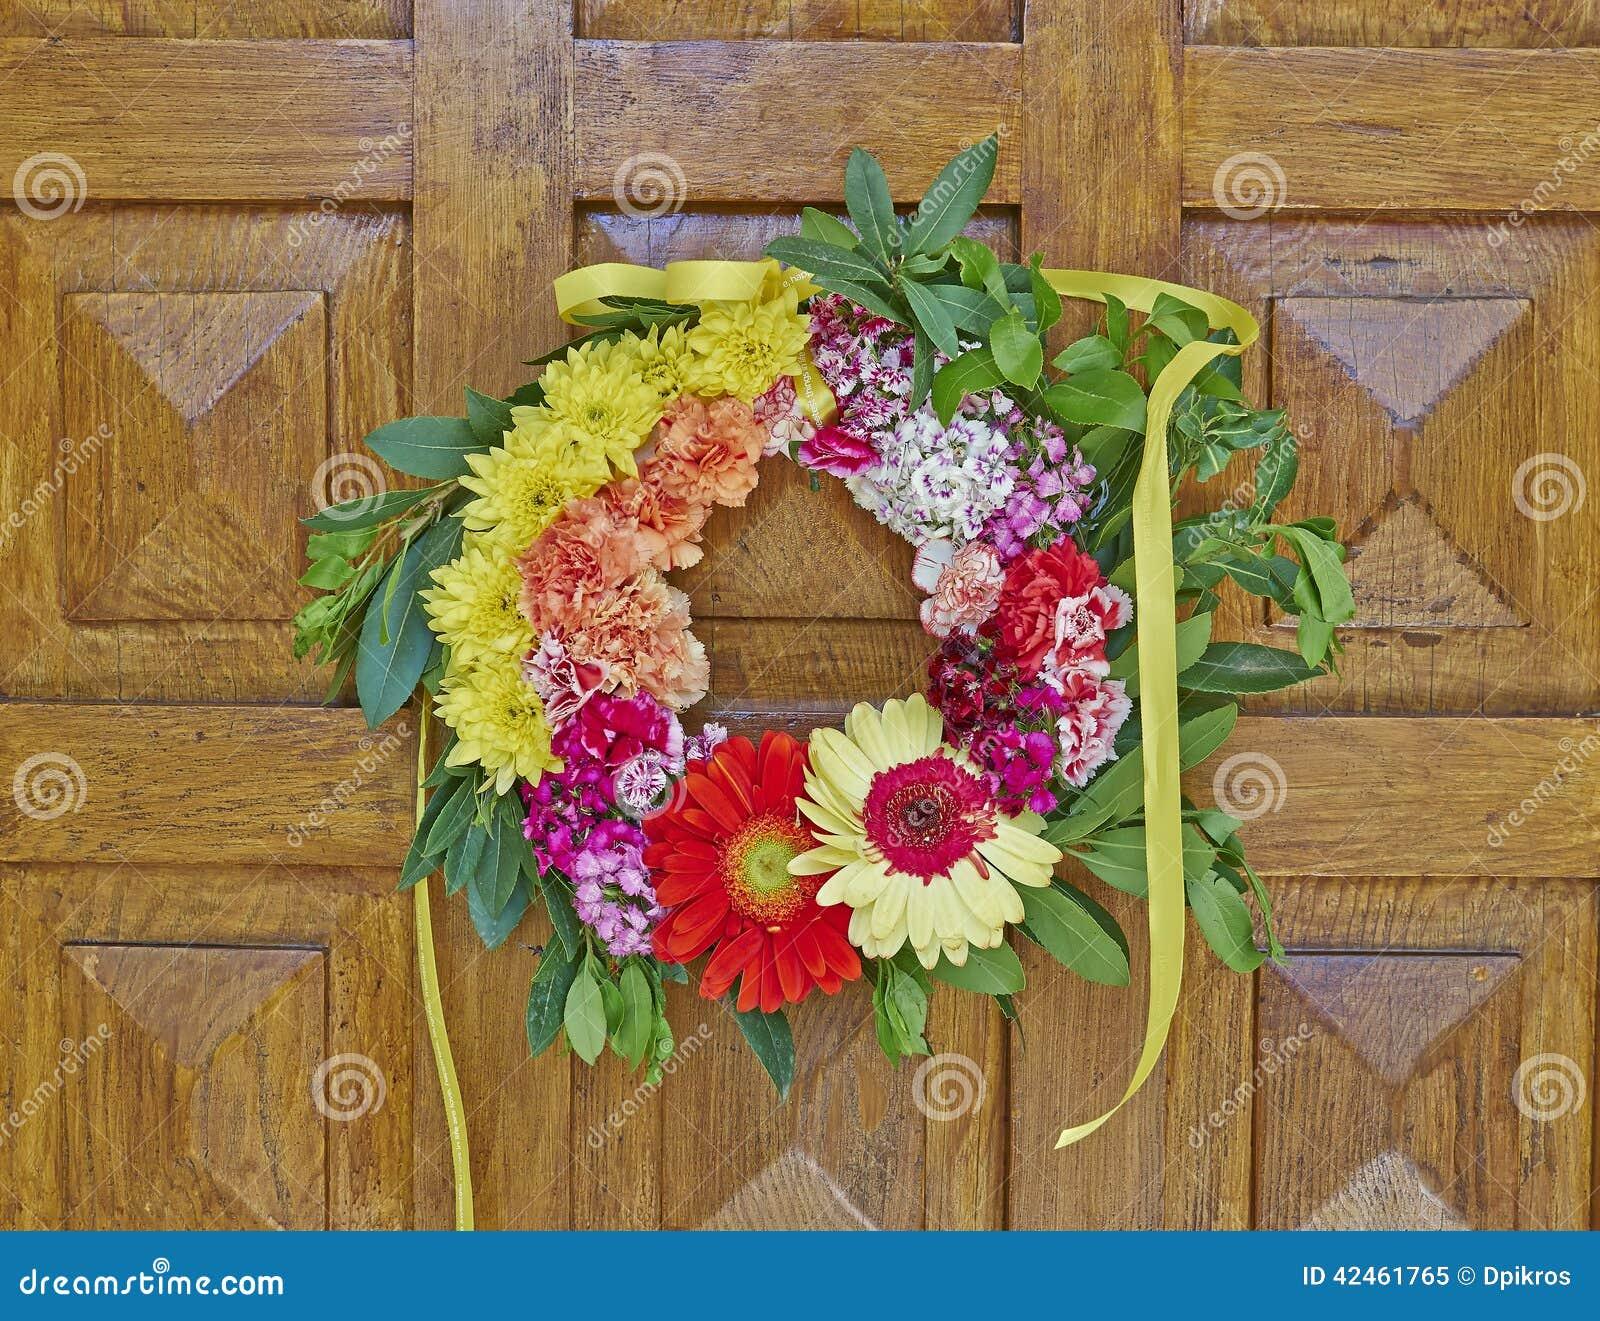 Blumenkranz, der an der Holztür hängt